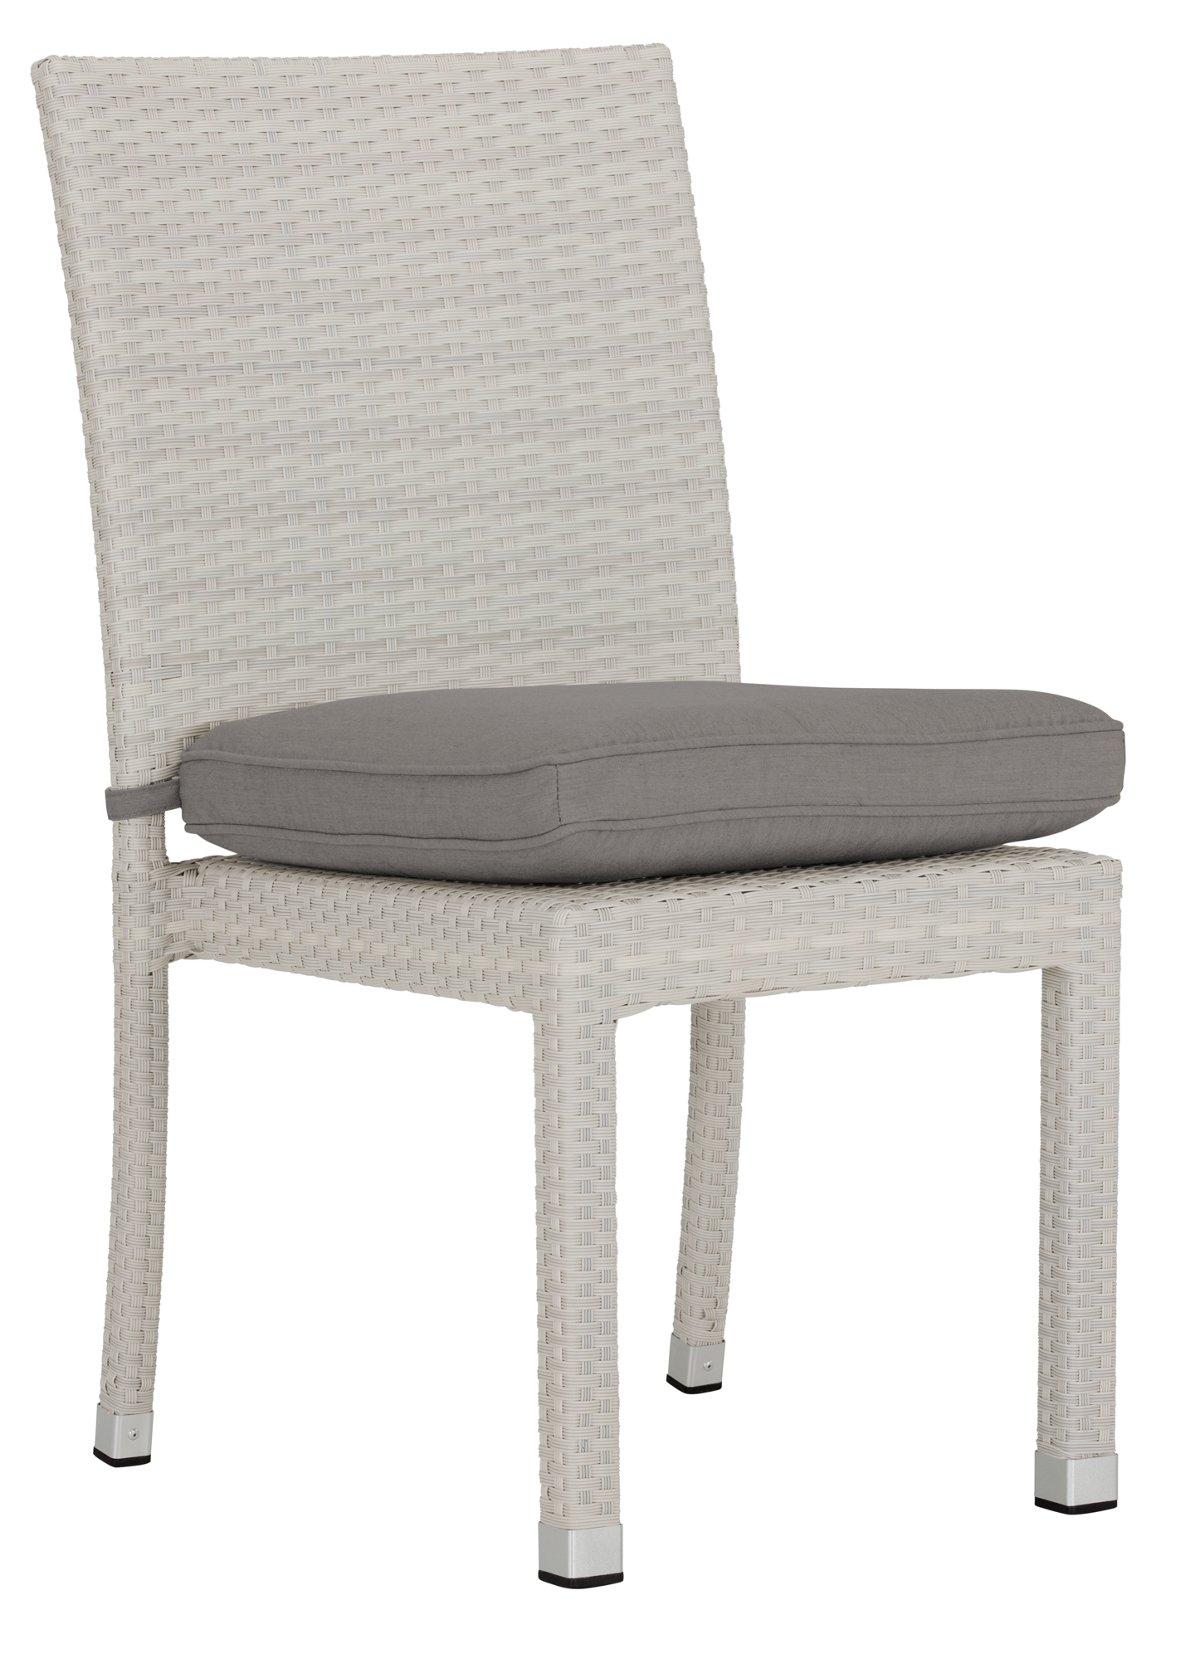 City Furniture Bahia Gray Side Chair